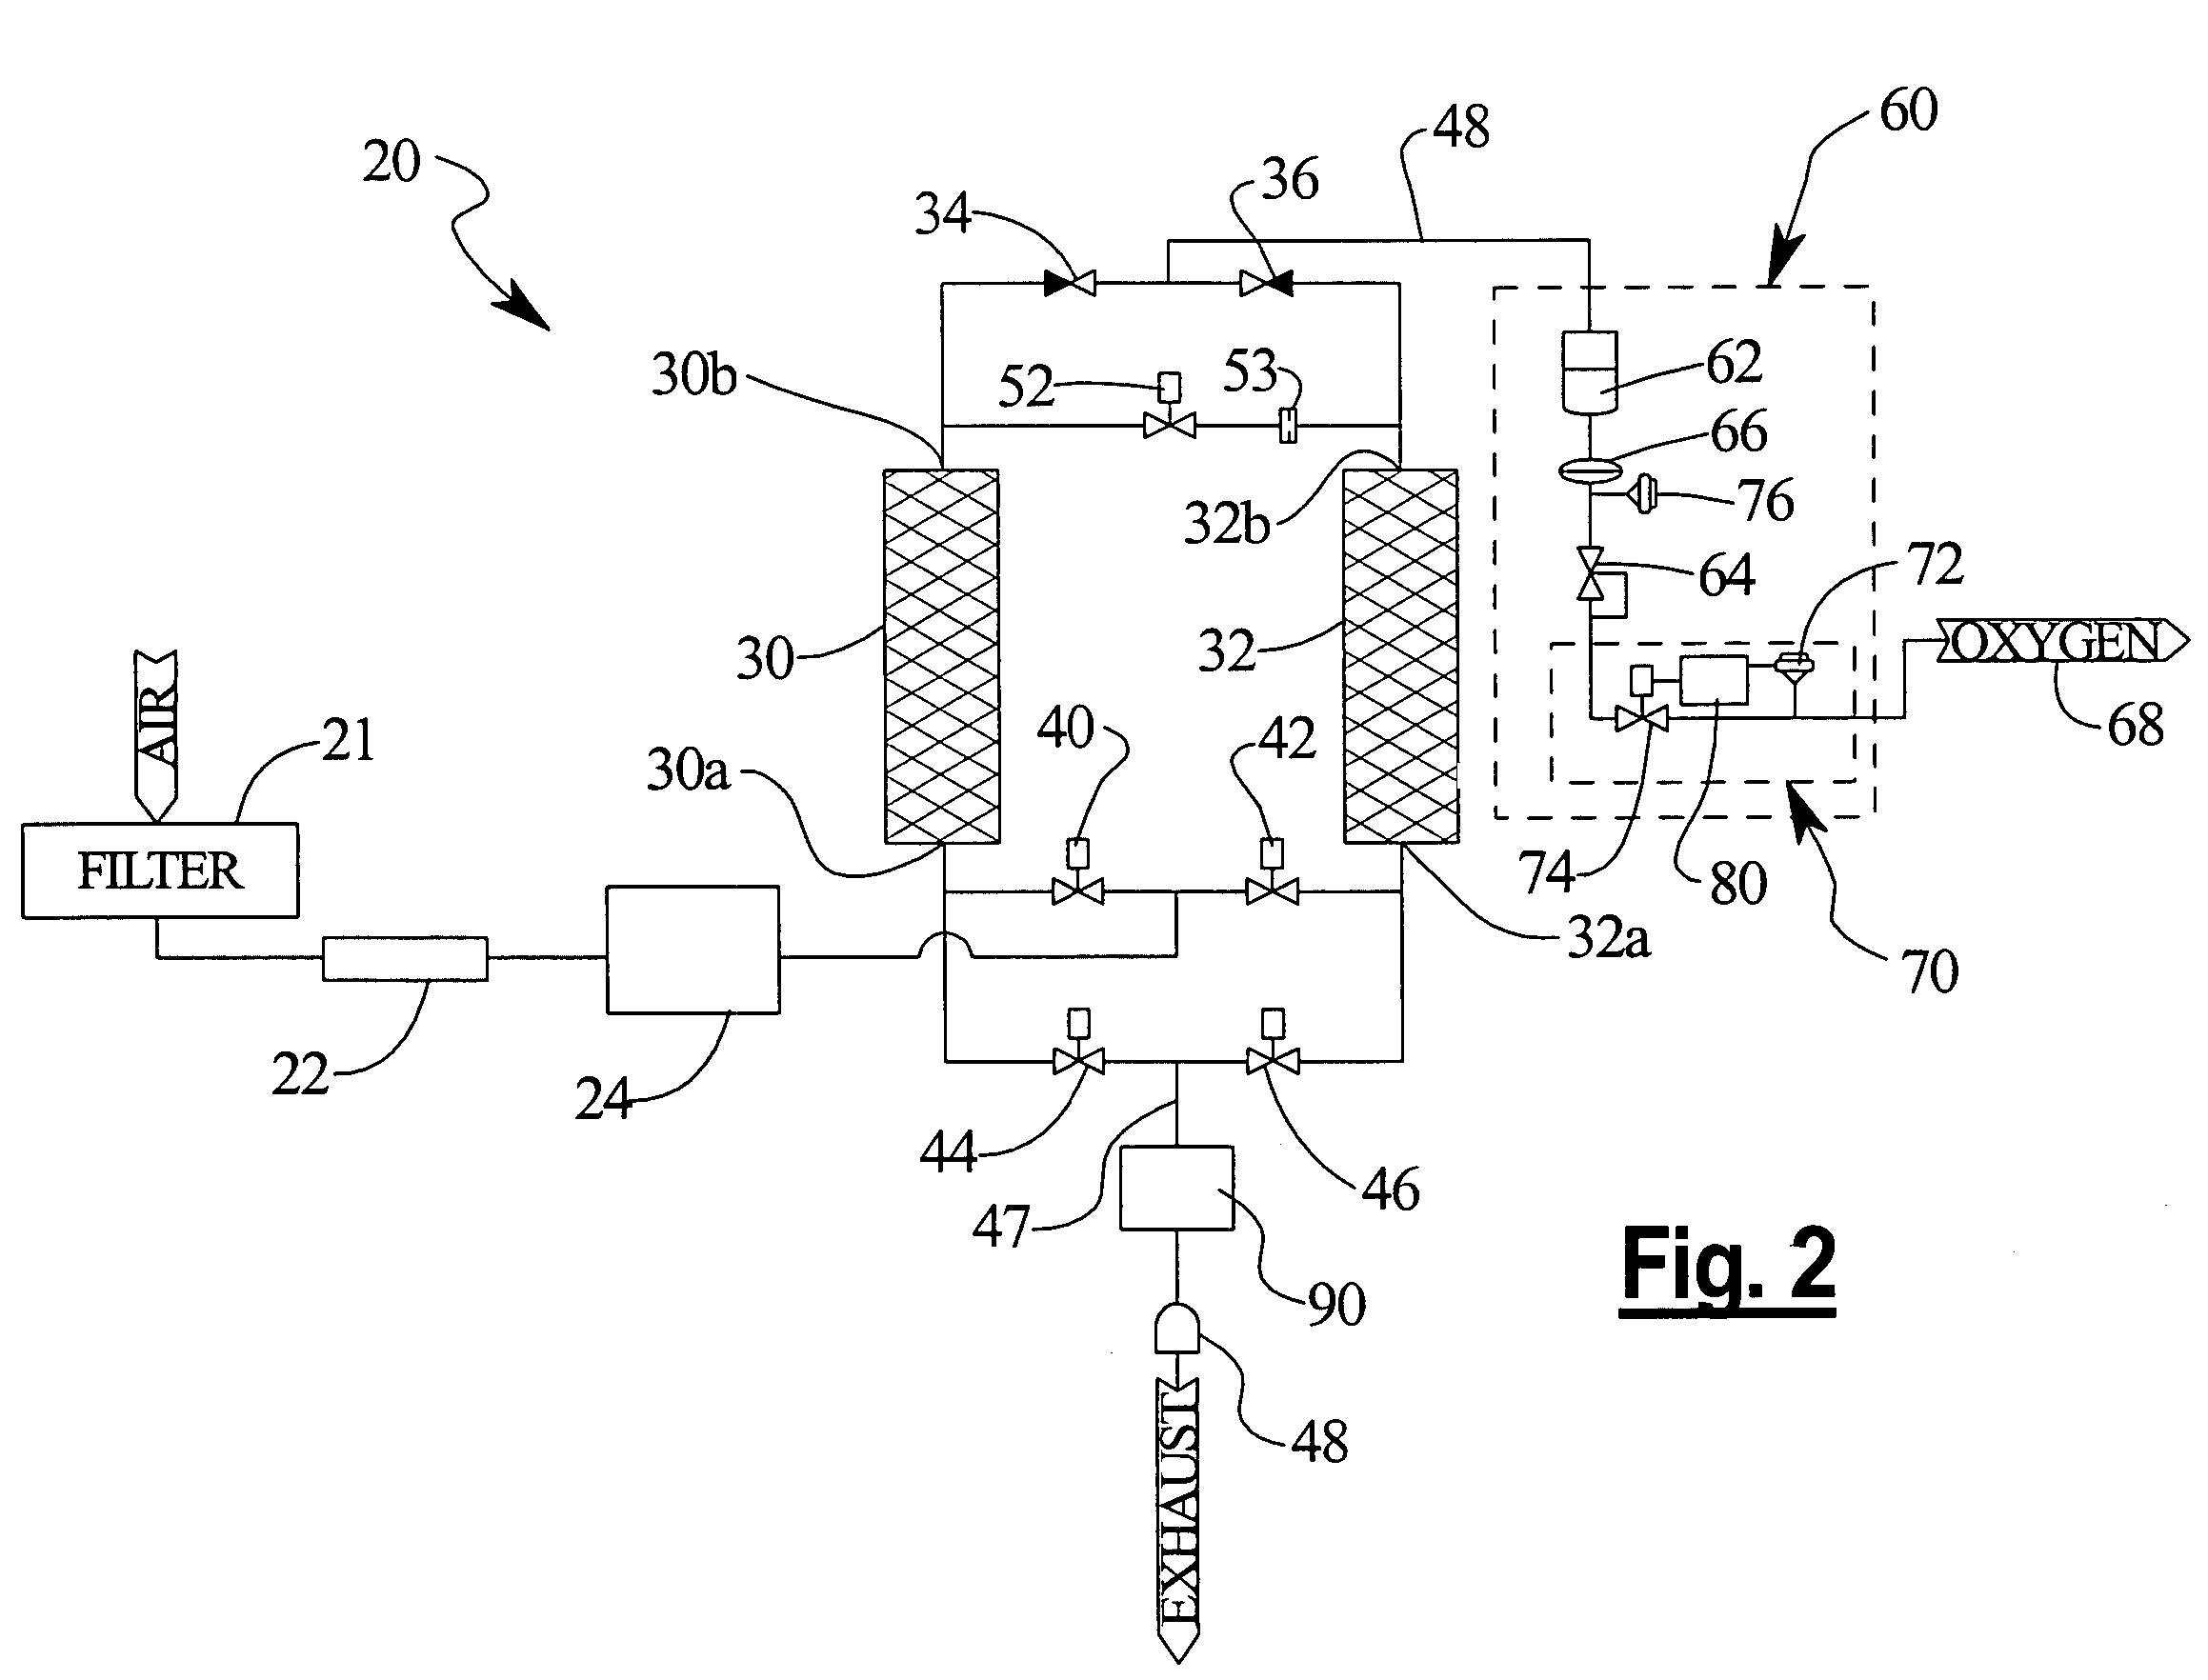 tree cnc mill wiring diagram